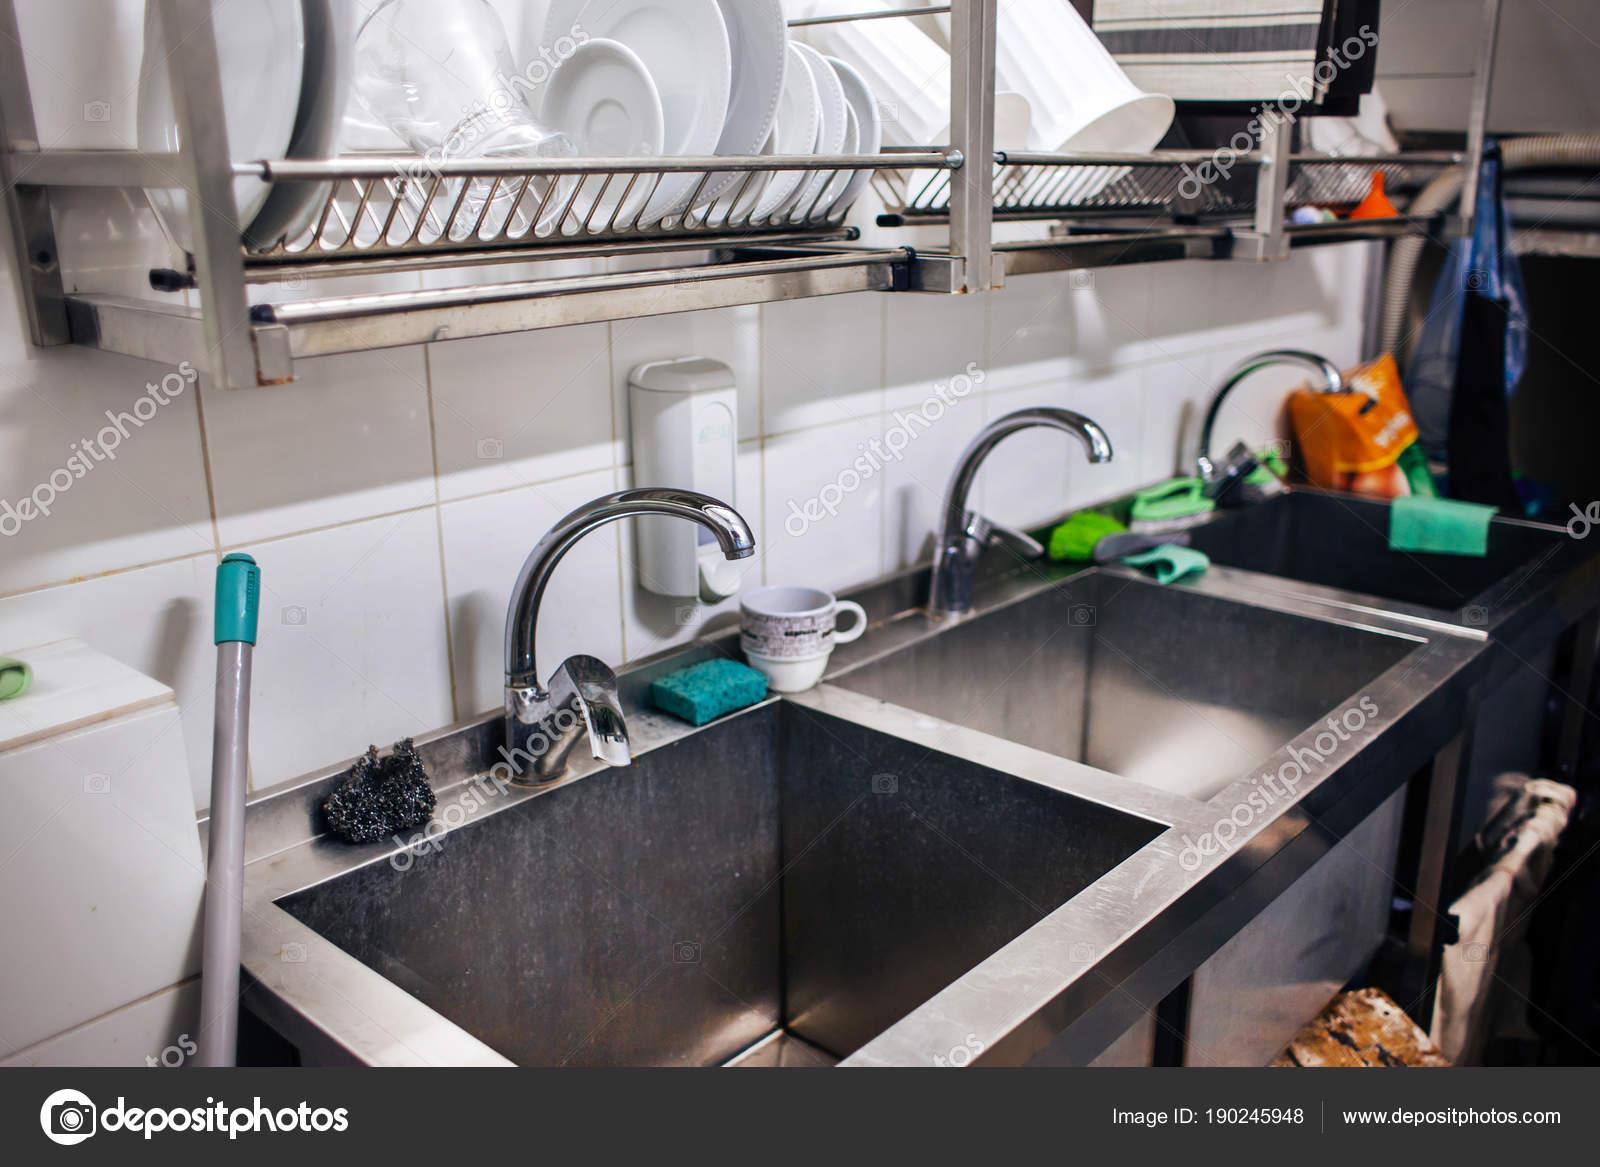 Kitchen Sinks Restaurant Stock Photo C Style Photo 190245948